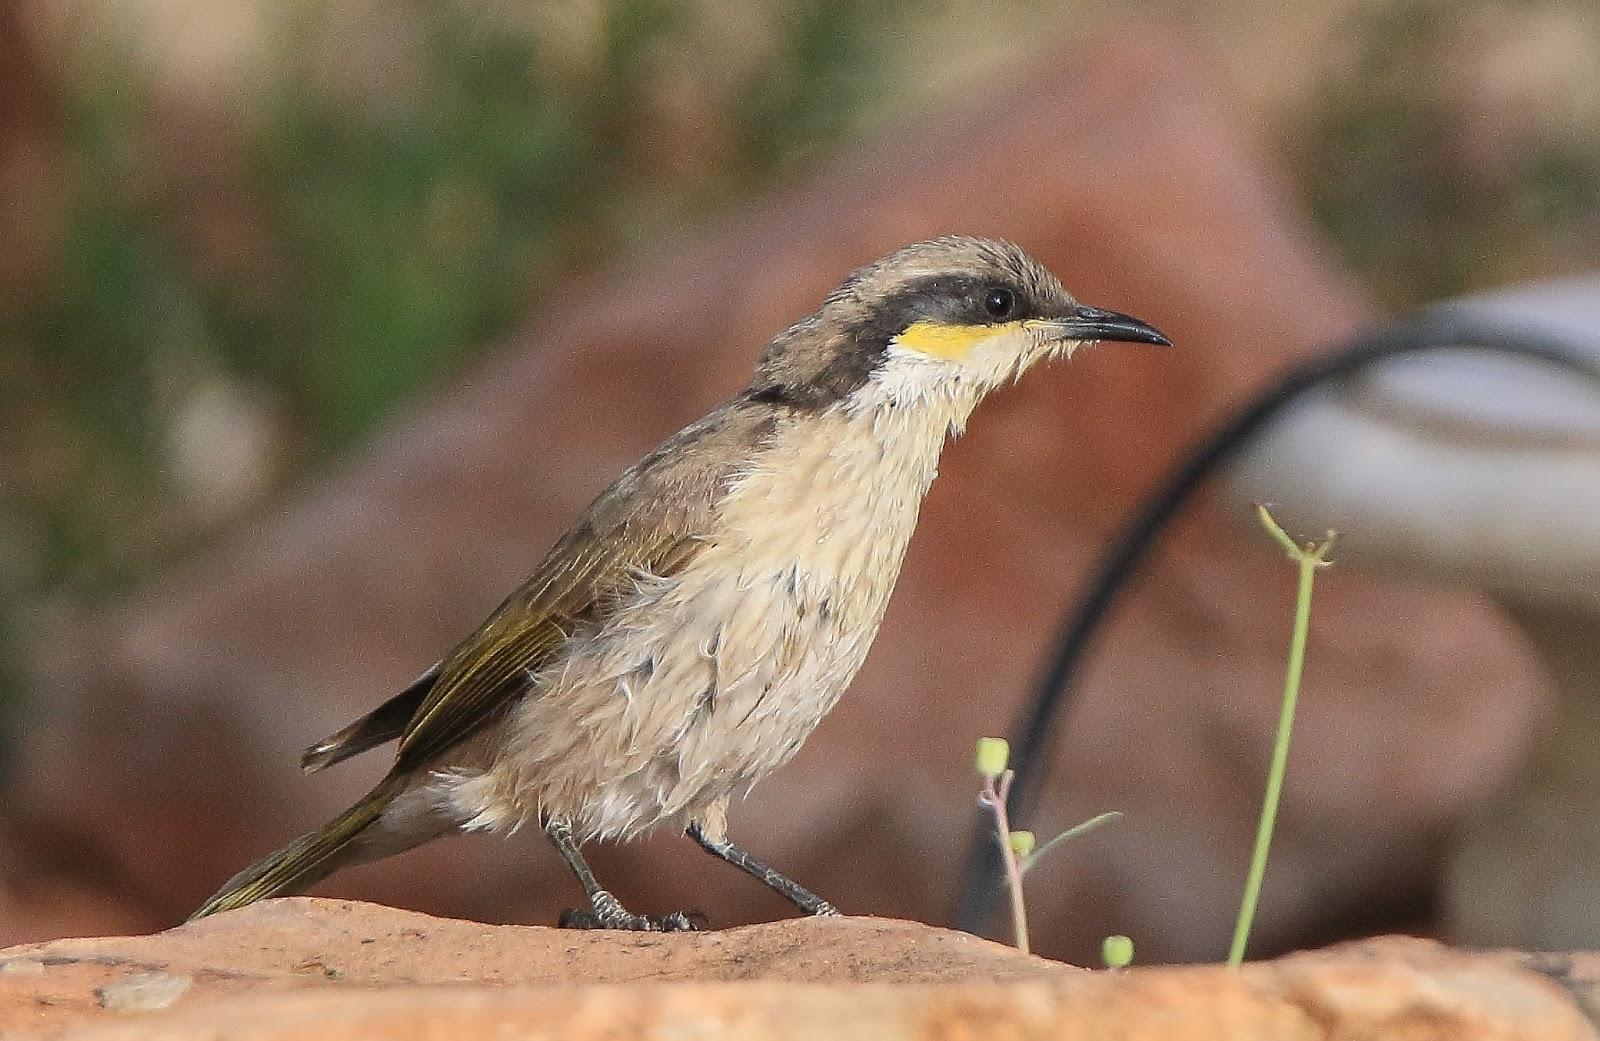 Richard Waring's Birds of Australia: Backyard Bird list ...